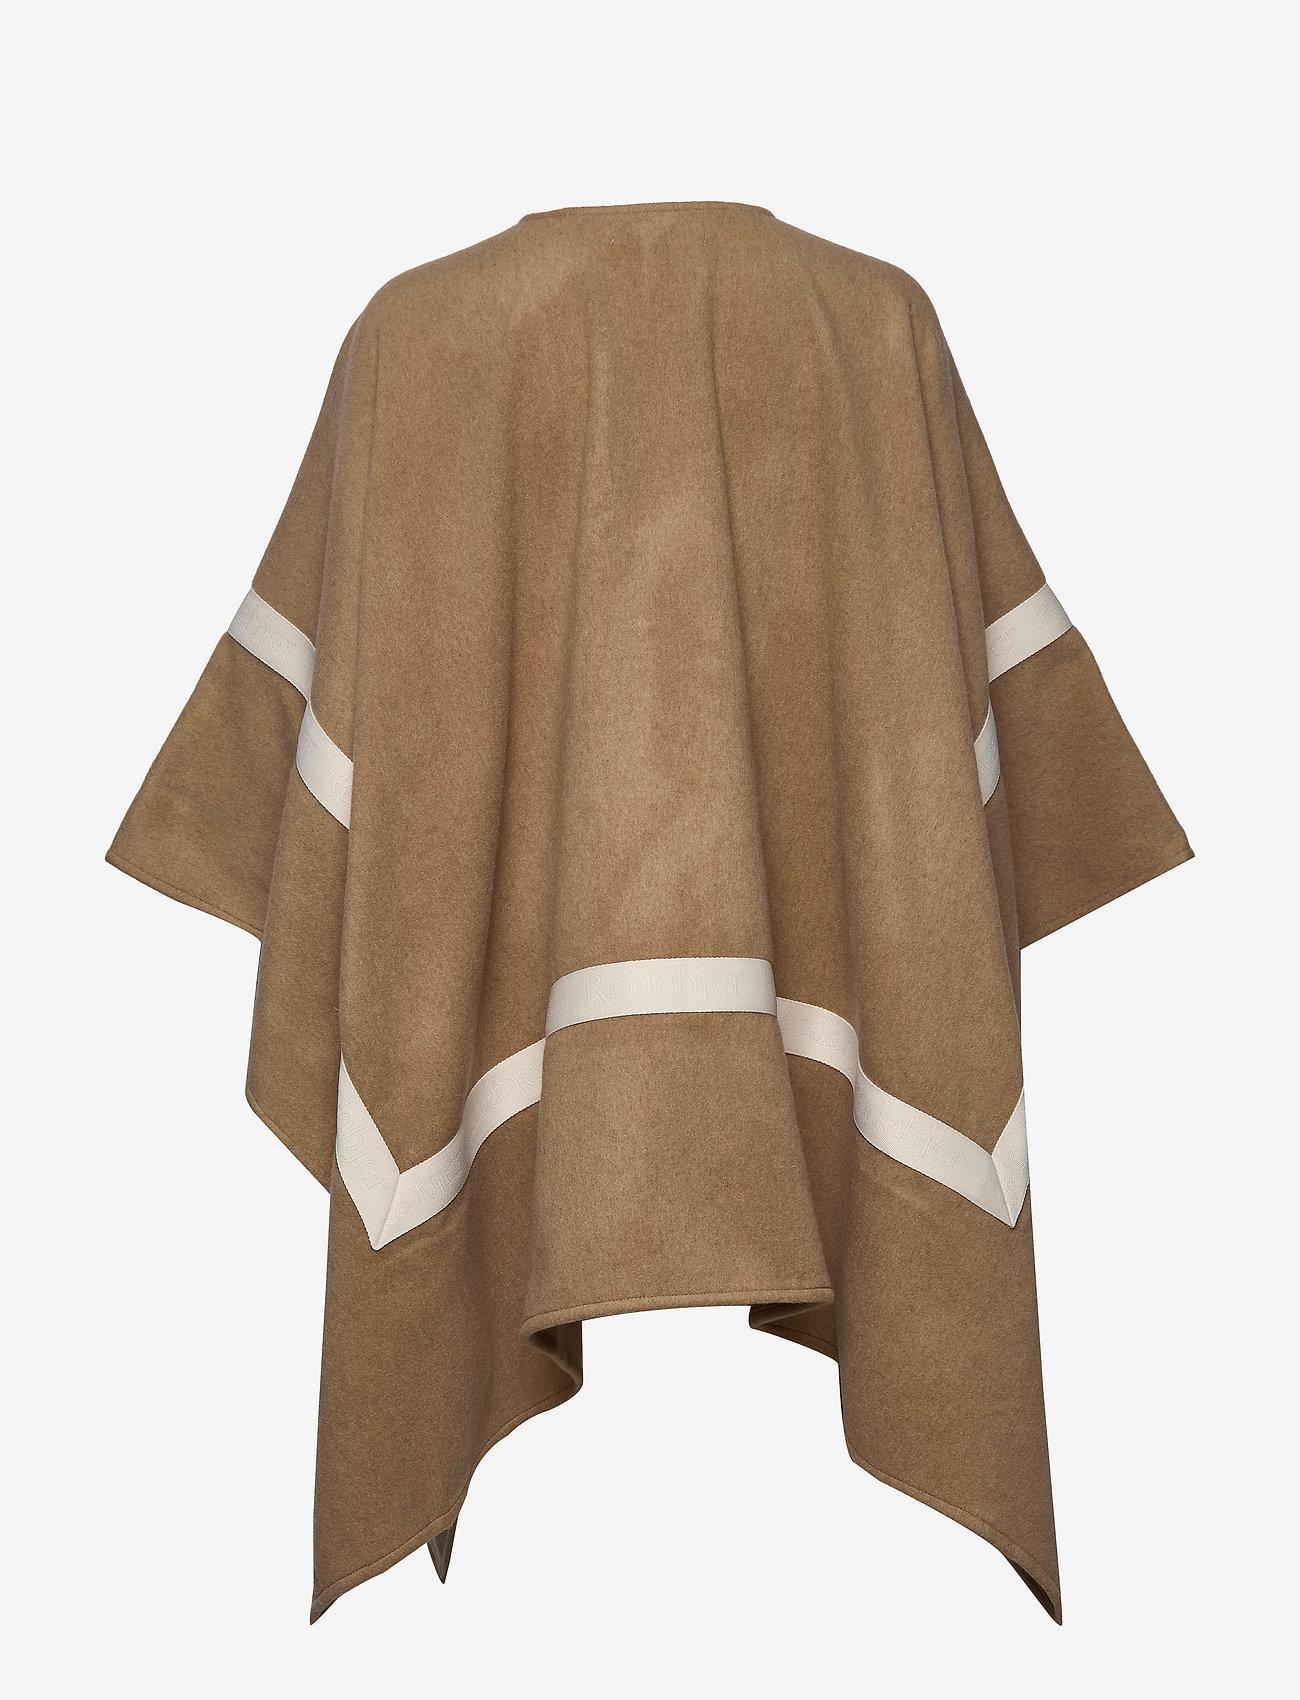 RODEBJER RODEBJER PUNALUU WOOL - Jackets & Coats CAMEL